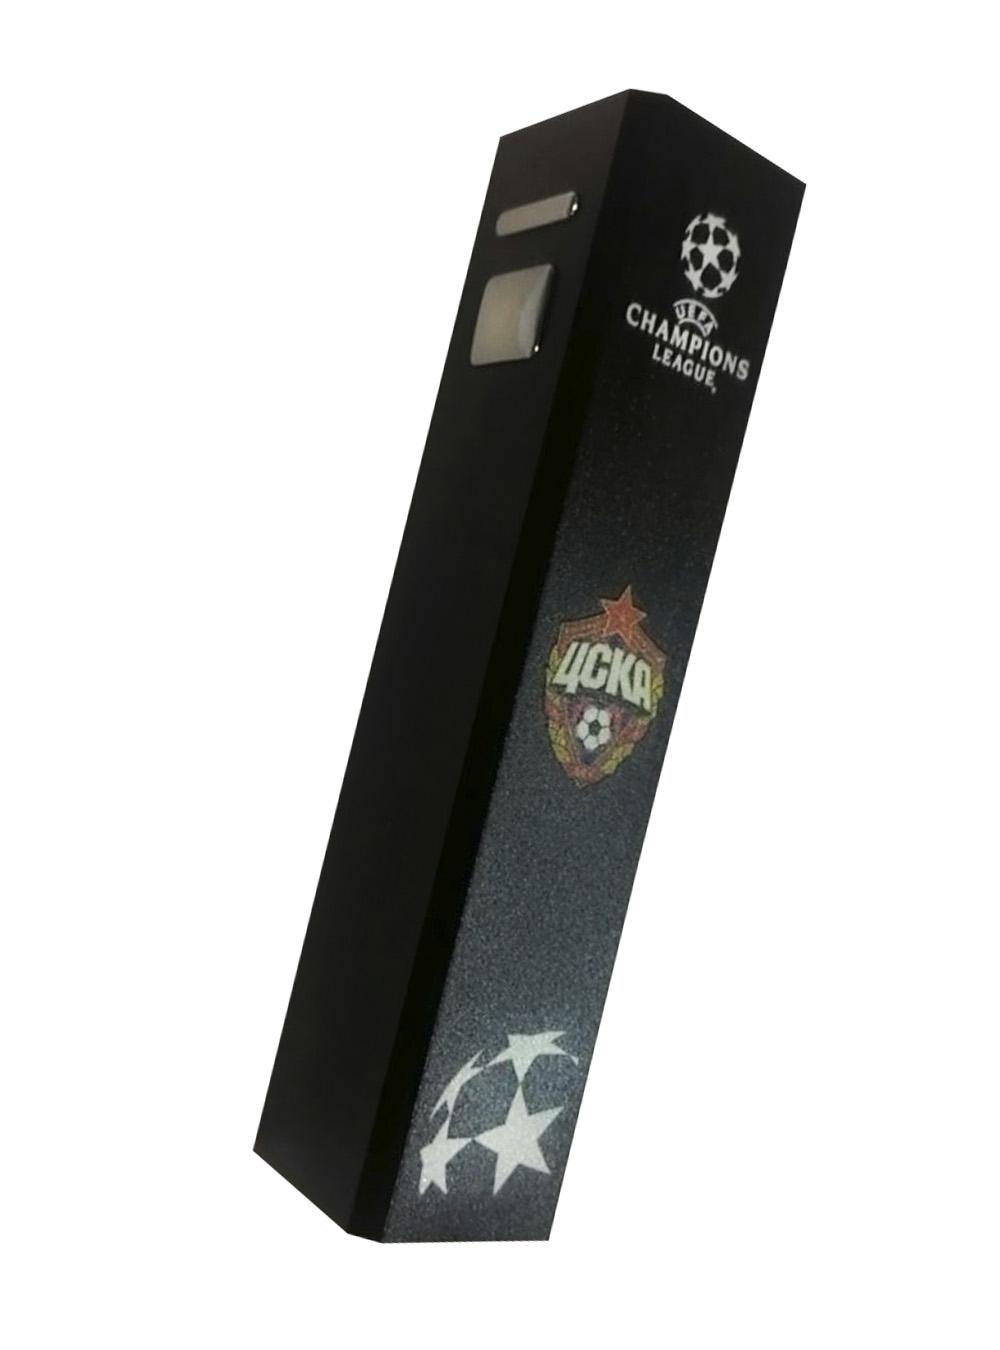 PowerBank внешний аккумулятор Champions League фото